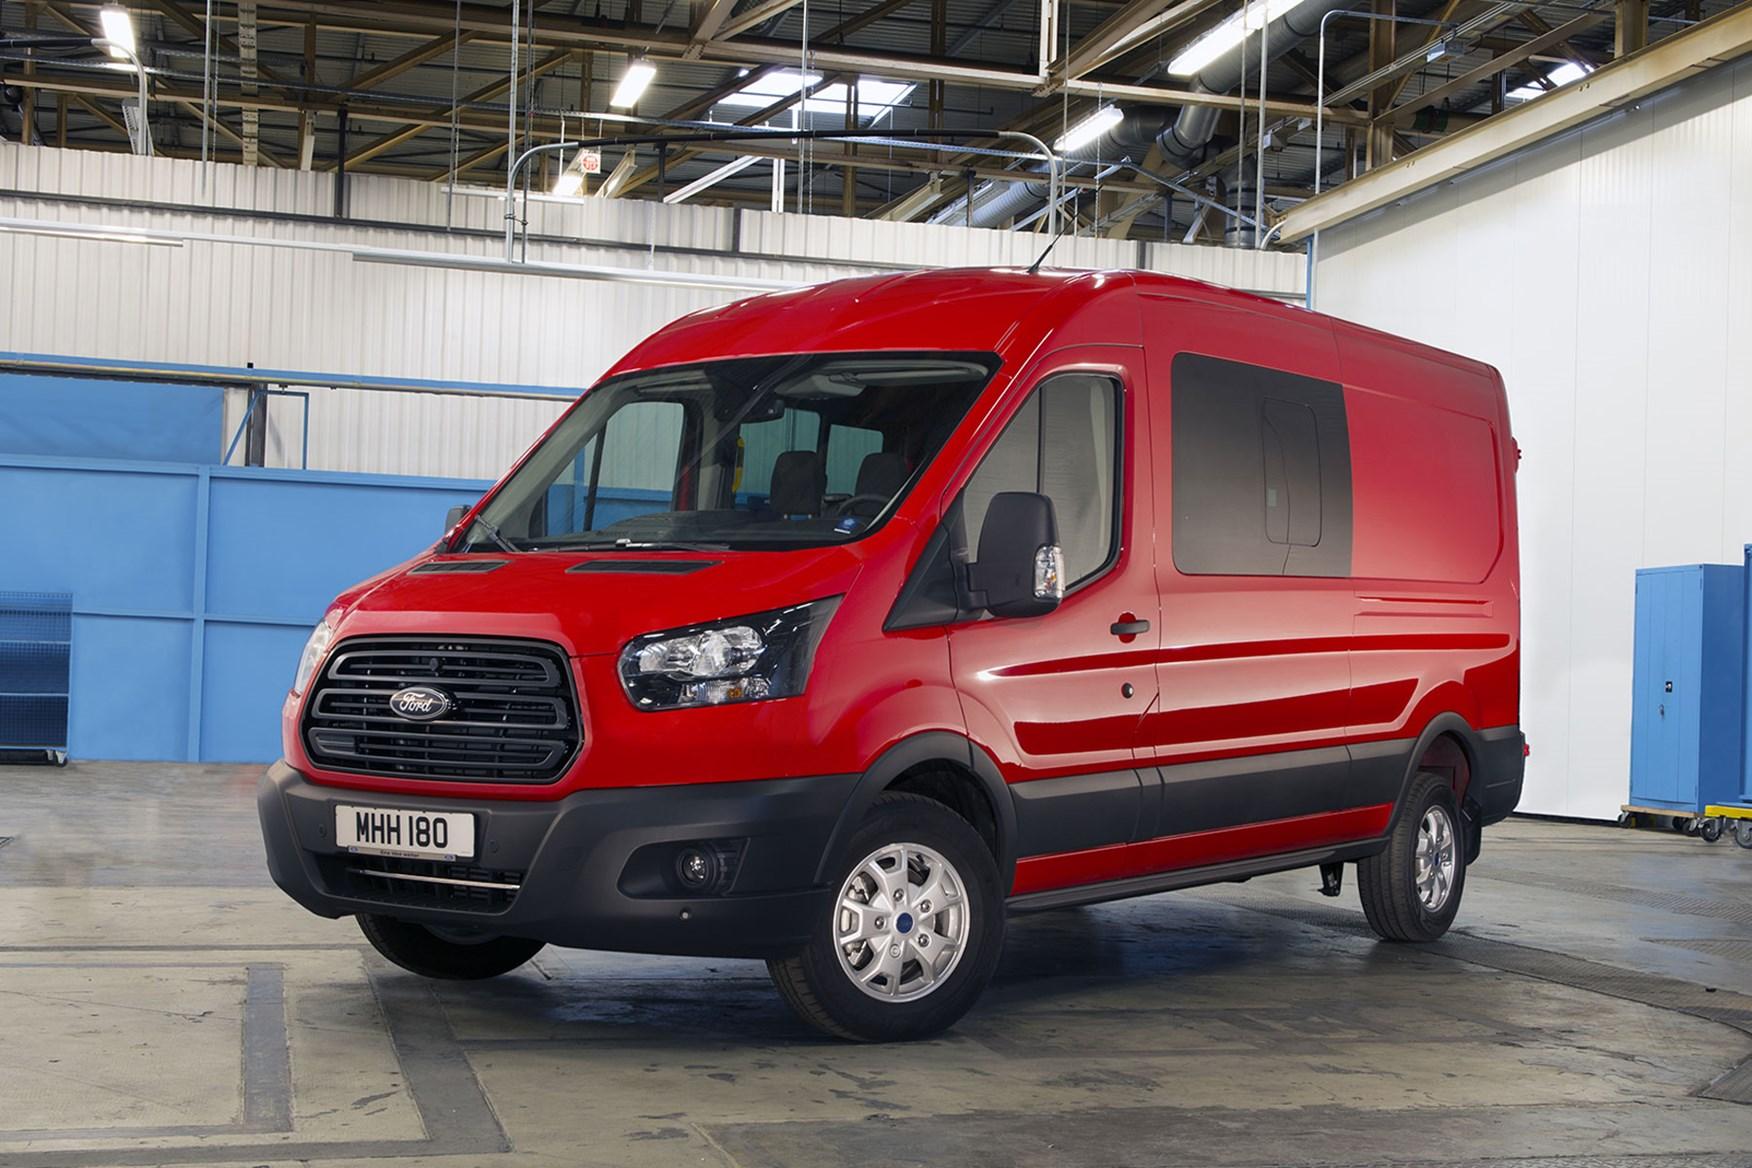 Ford Transit van dimensions, capacity, payload, volume